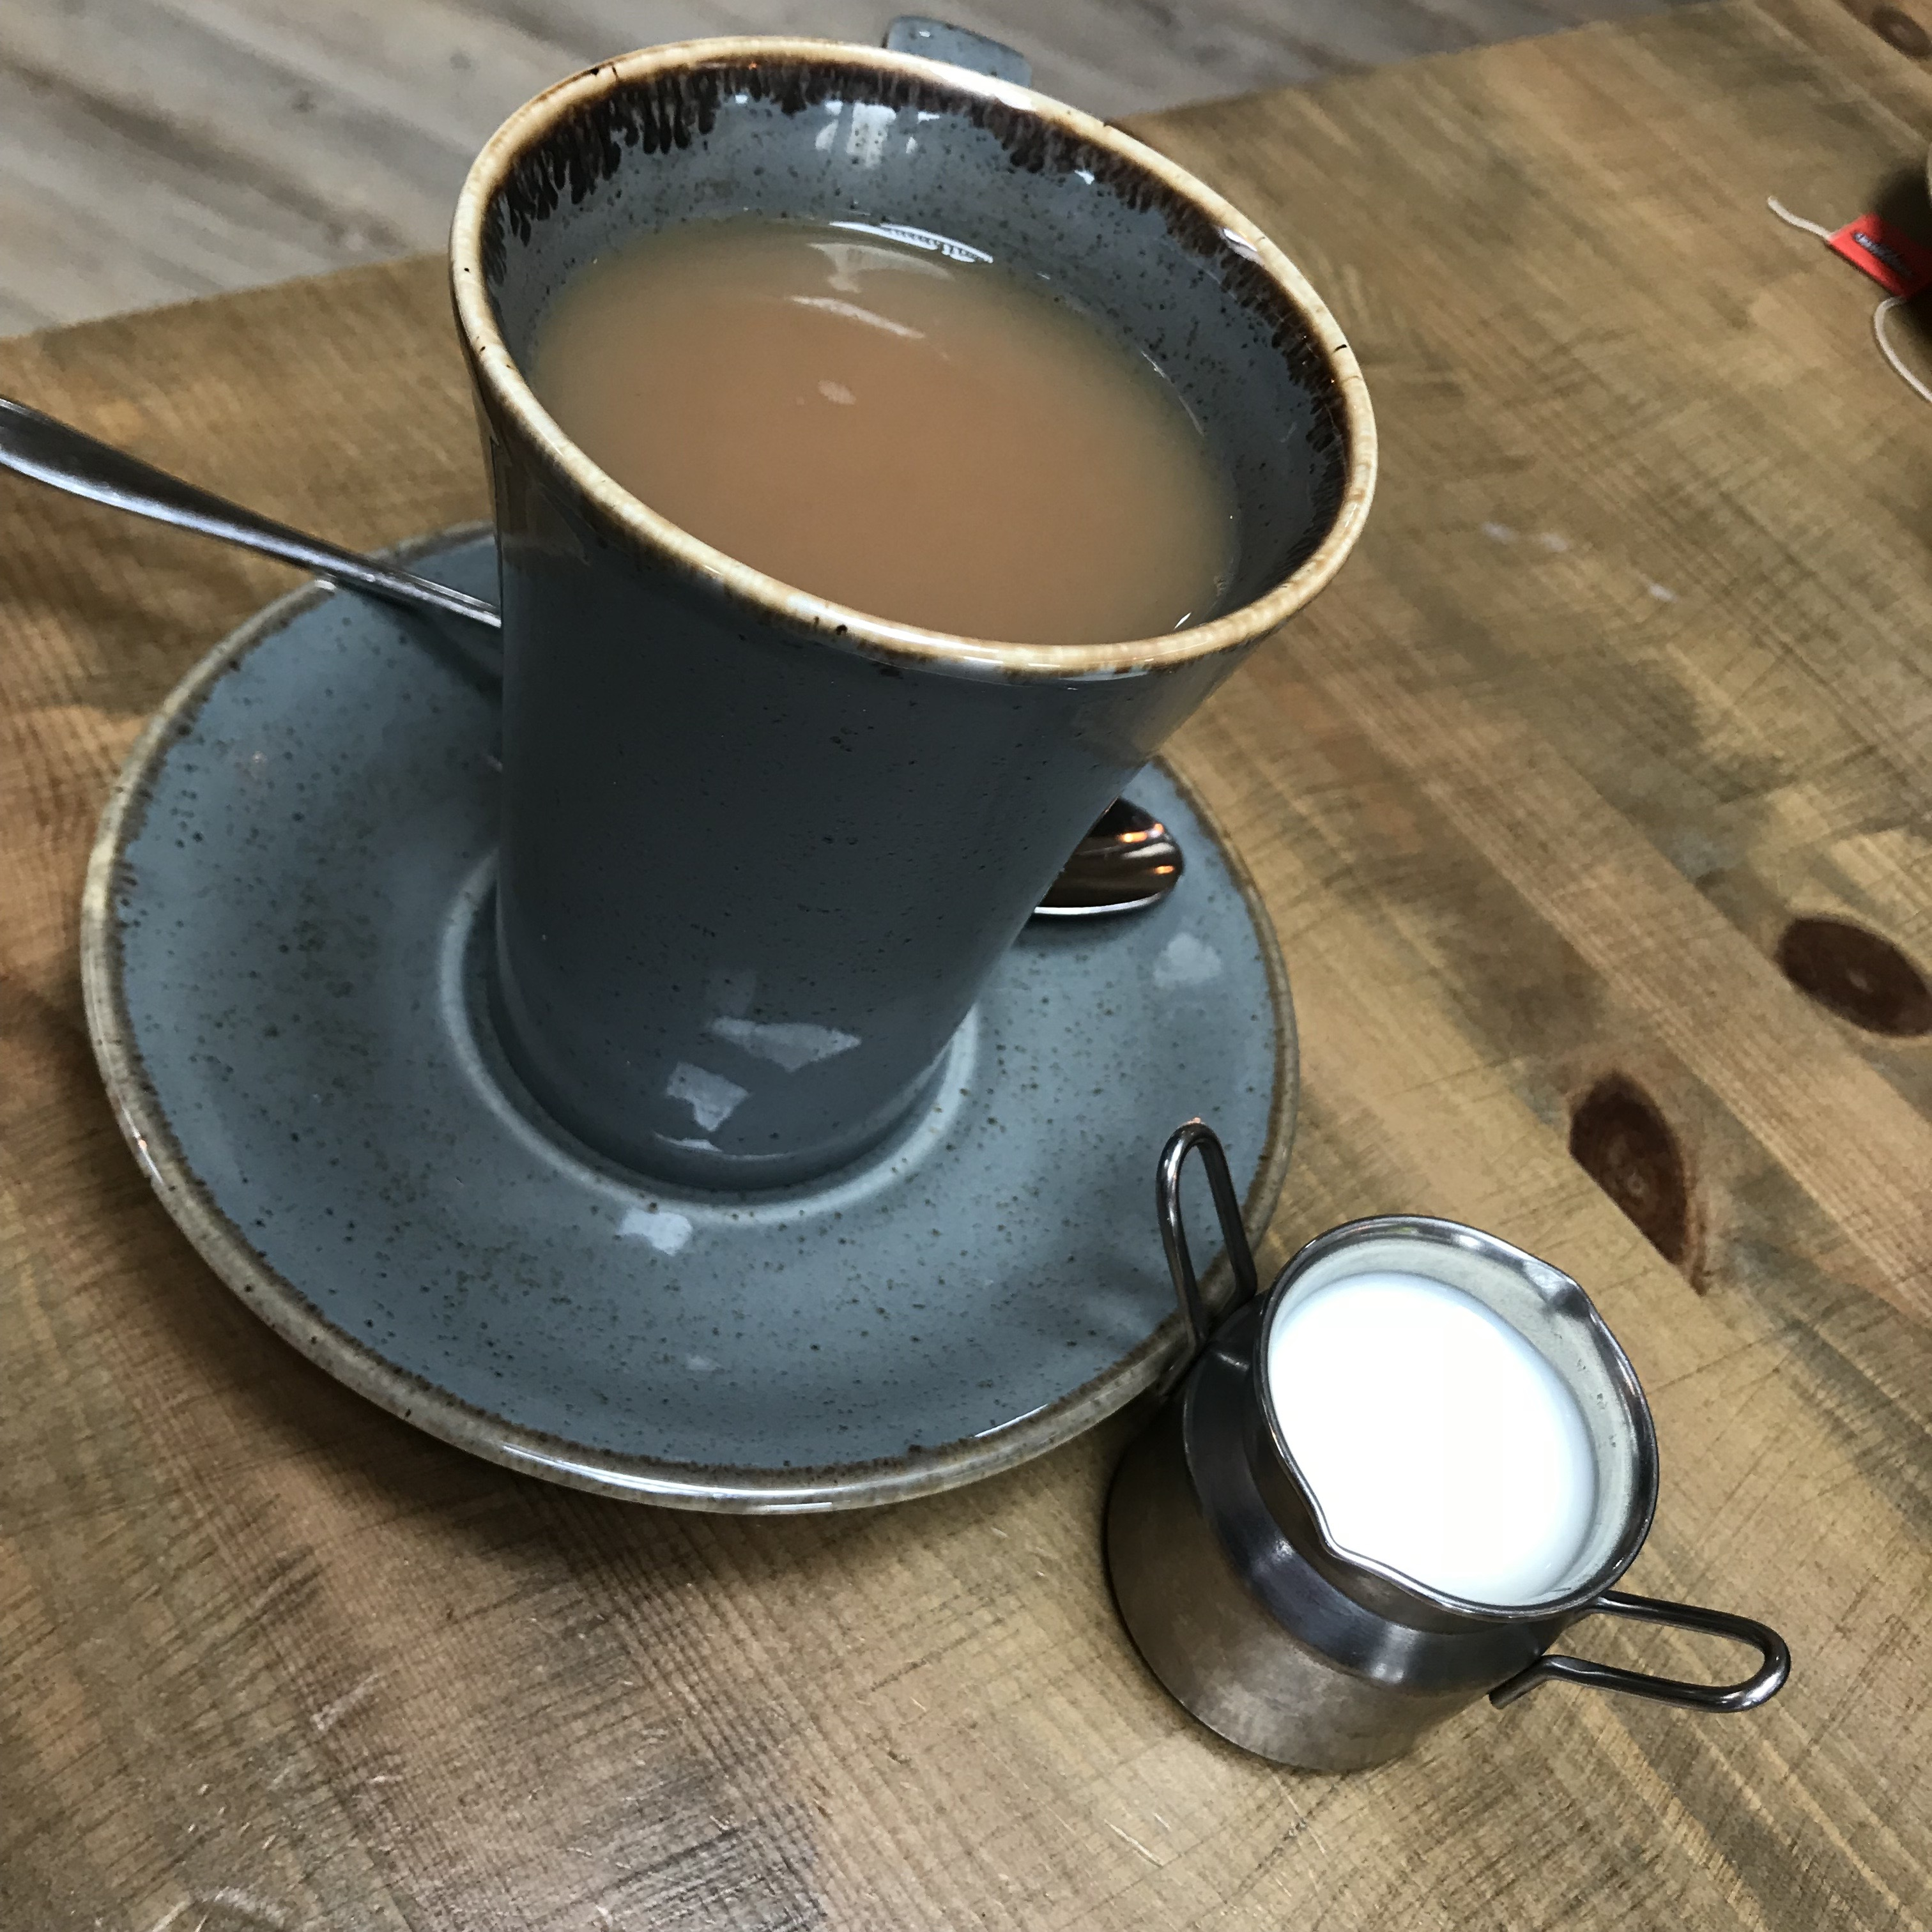 mug of tea and milk in a little jug